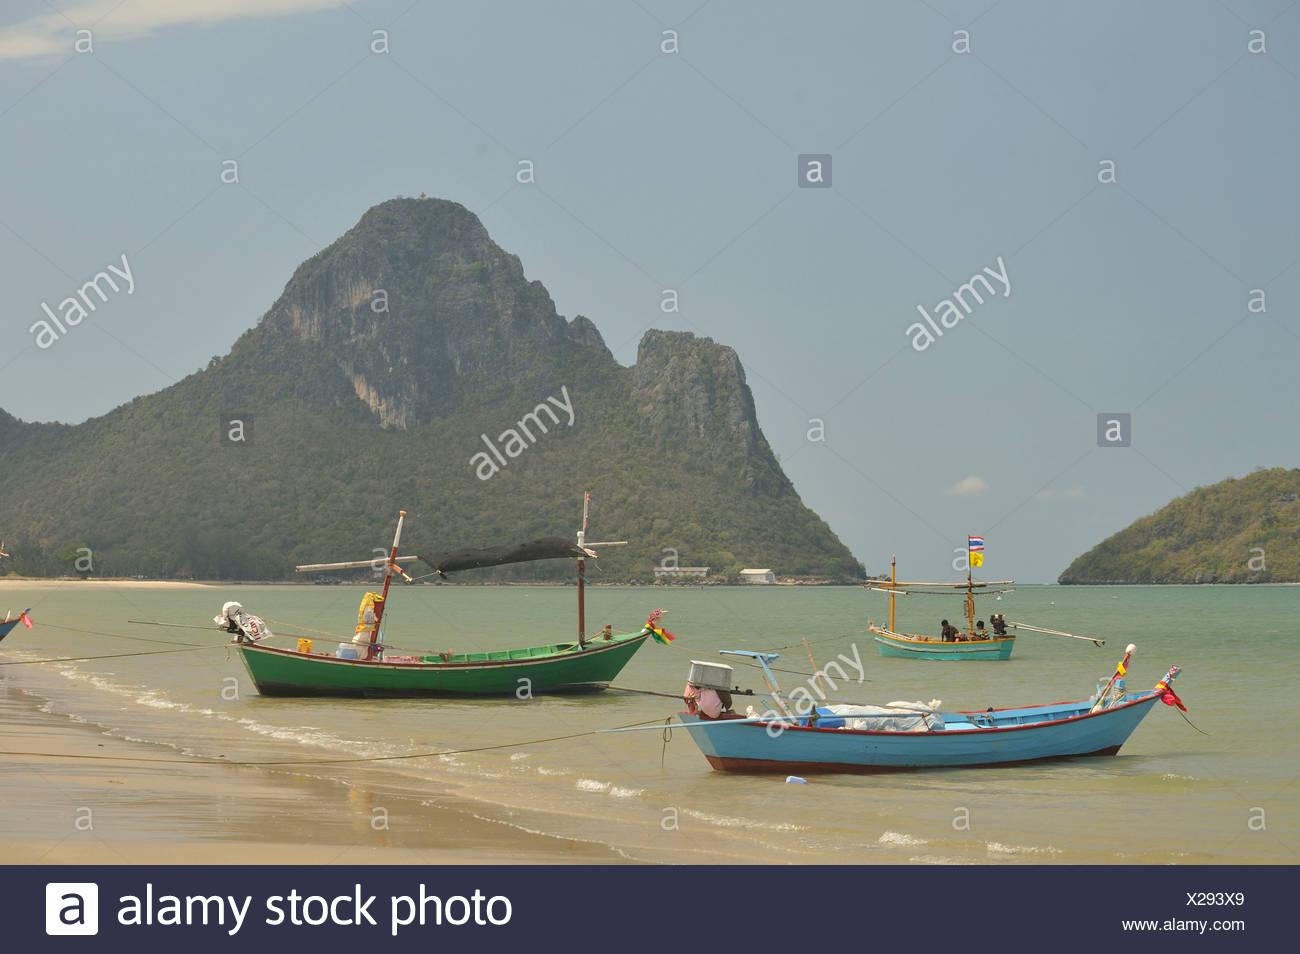 beached fishing boats in Prachuap Kiri Khan Harbour, Gulf of Thailand, Thailand - Stock Image